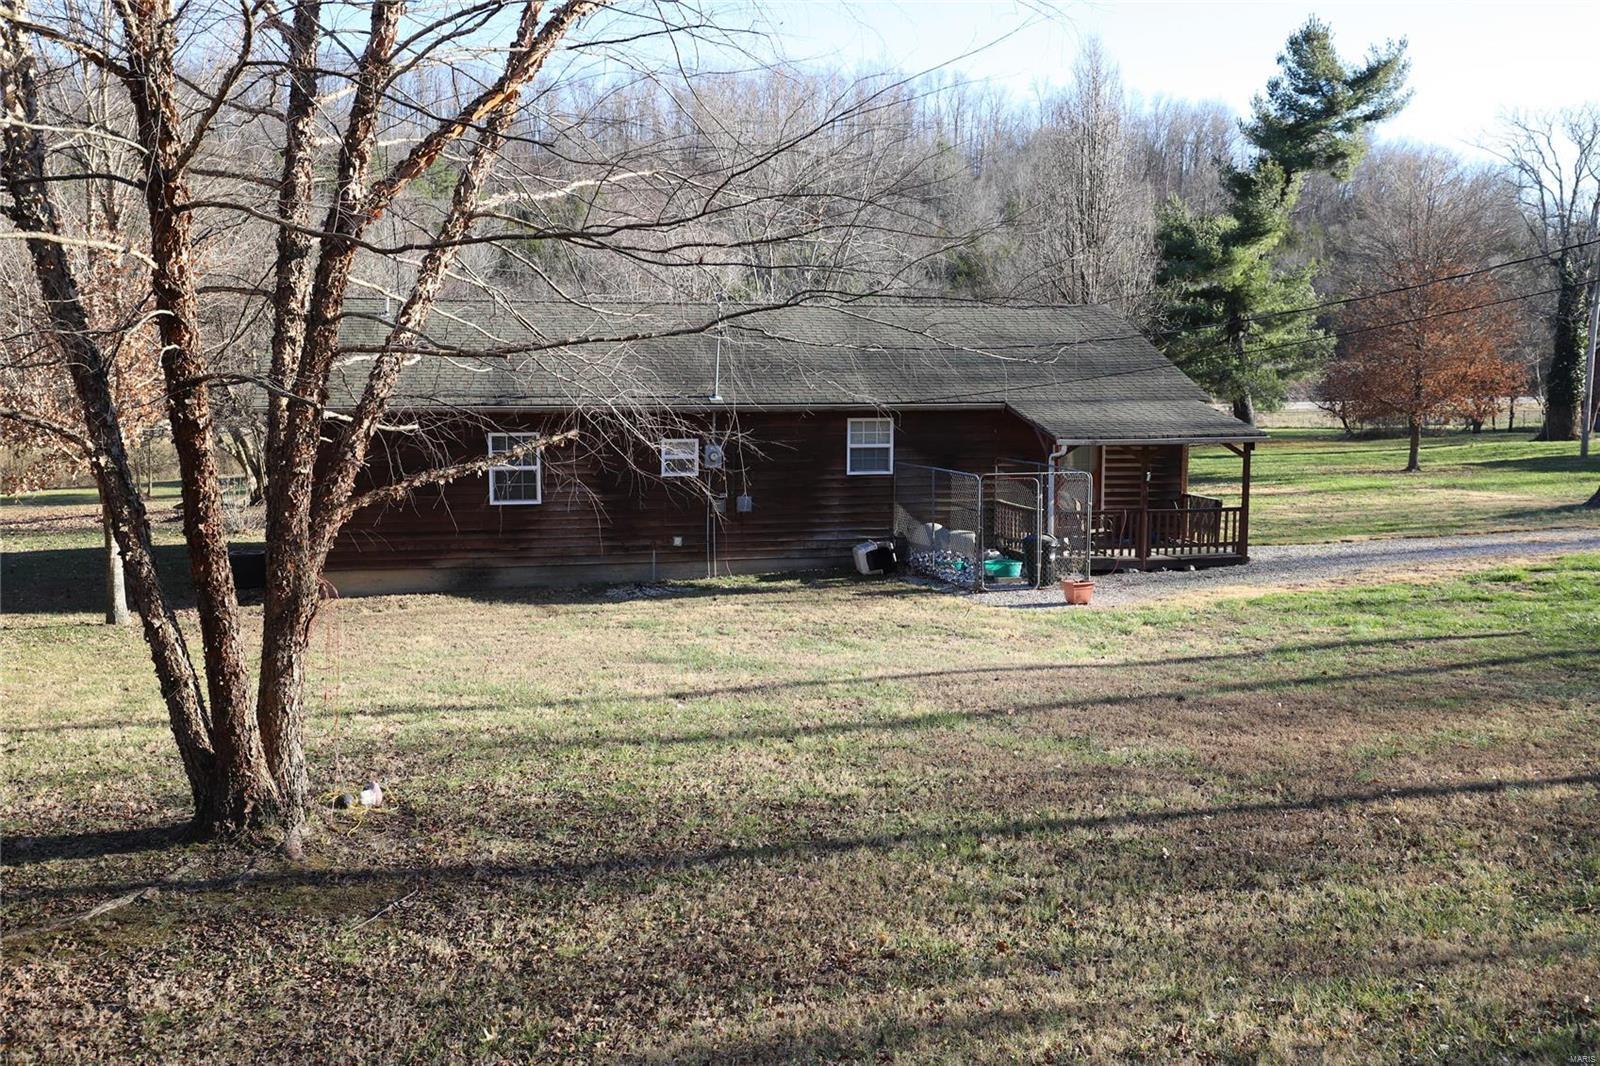 720 south main street Property Photo - Arcadia, MO real estate listing